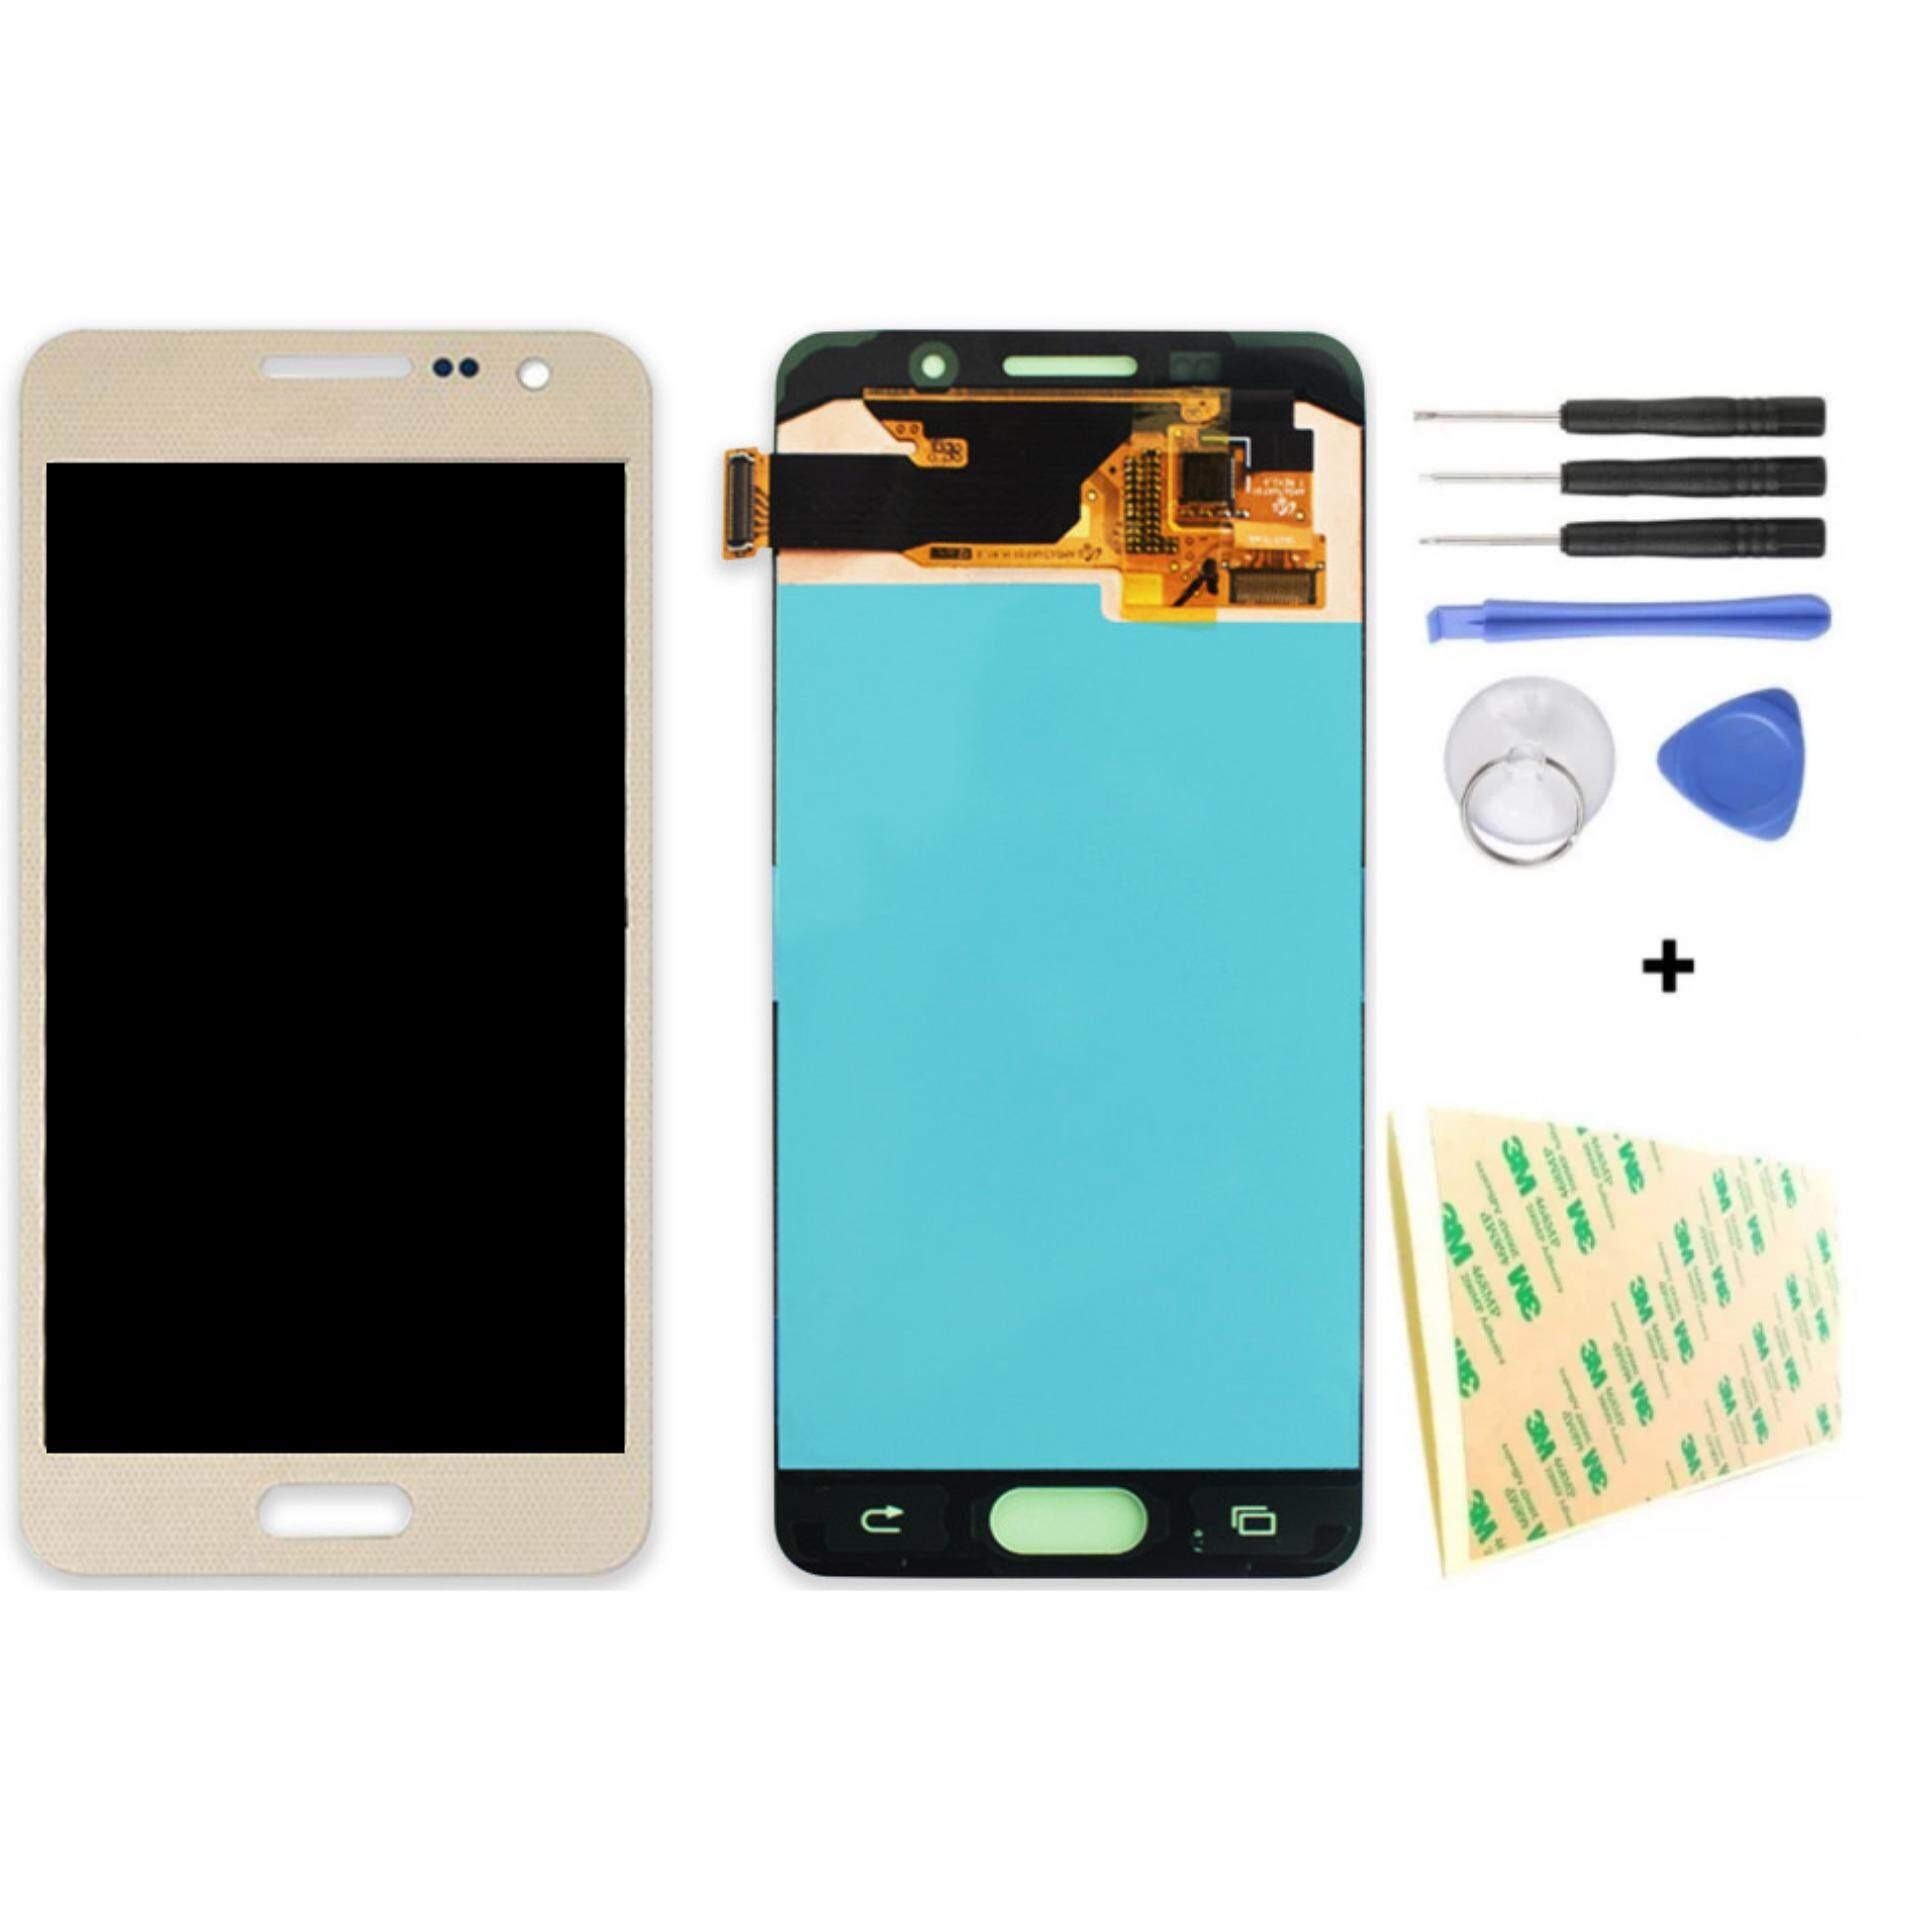 Untuk Samsung Galaksi A3 2016 A310 A3100F A3100 A310F LCD Tampilan Sentuh Scree Ponsel Digitizer Perakitan